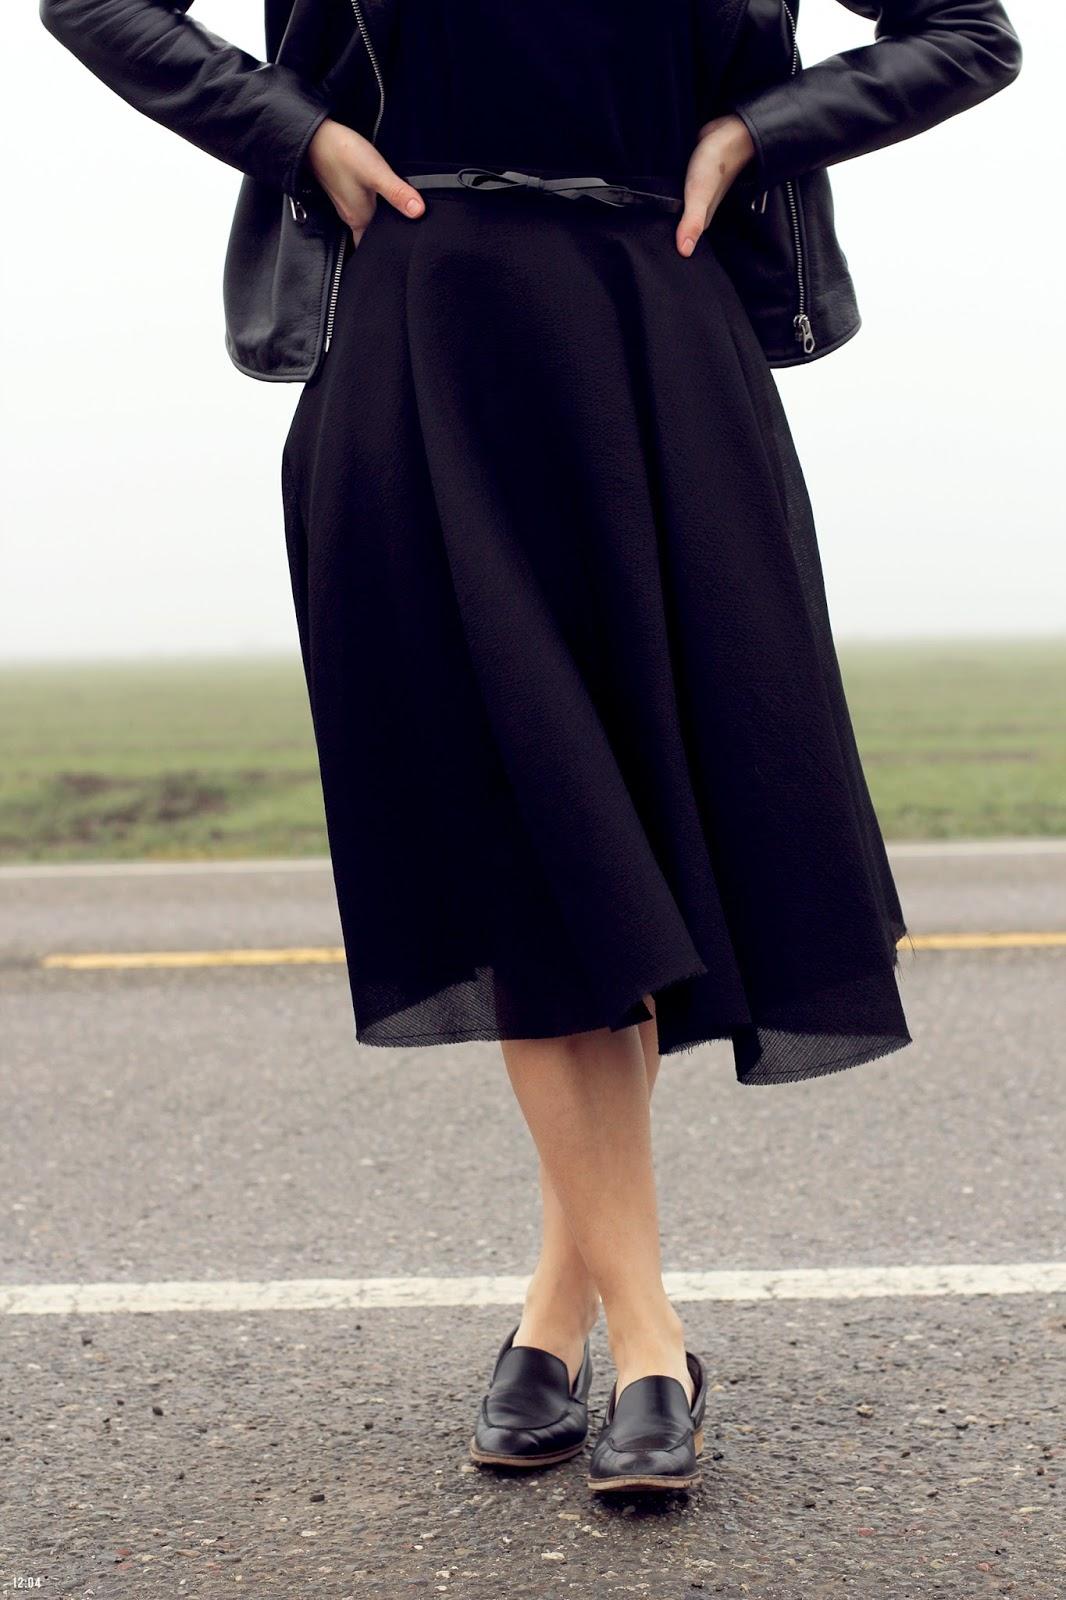 1275-twelvoefour-dixon-fog-all-black-yang-li-everlane-IMG_5743.jpg